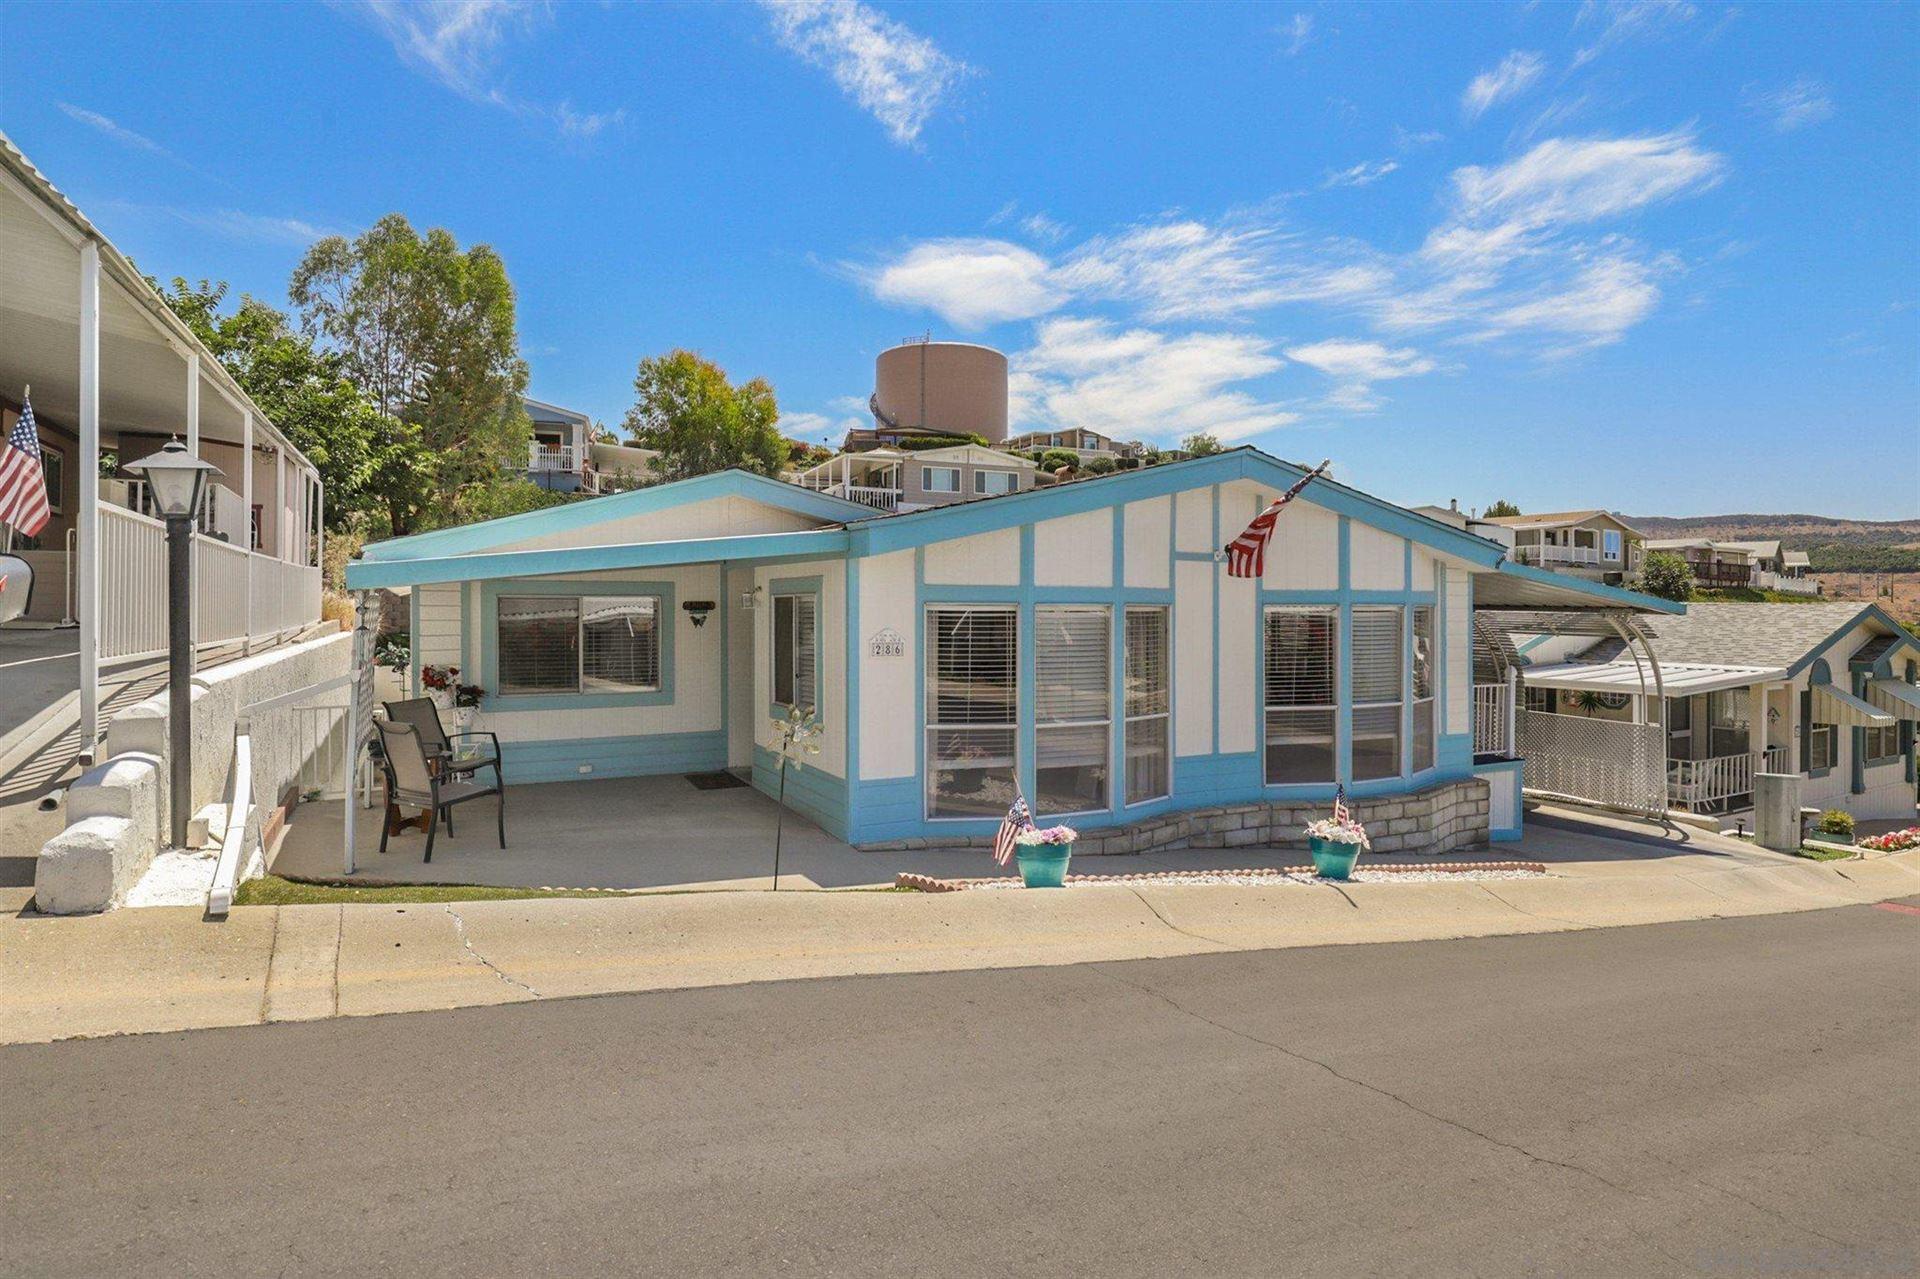 Photo of 9500 Harritt #286, Lakeside, CA 92040 (MLS # 210021691)